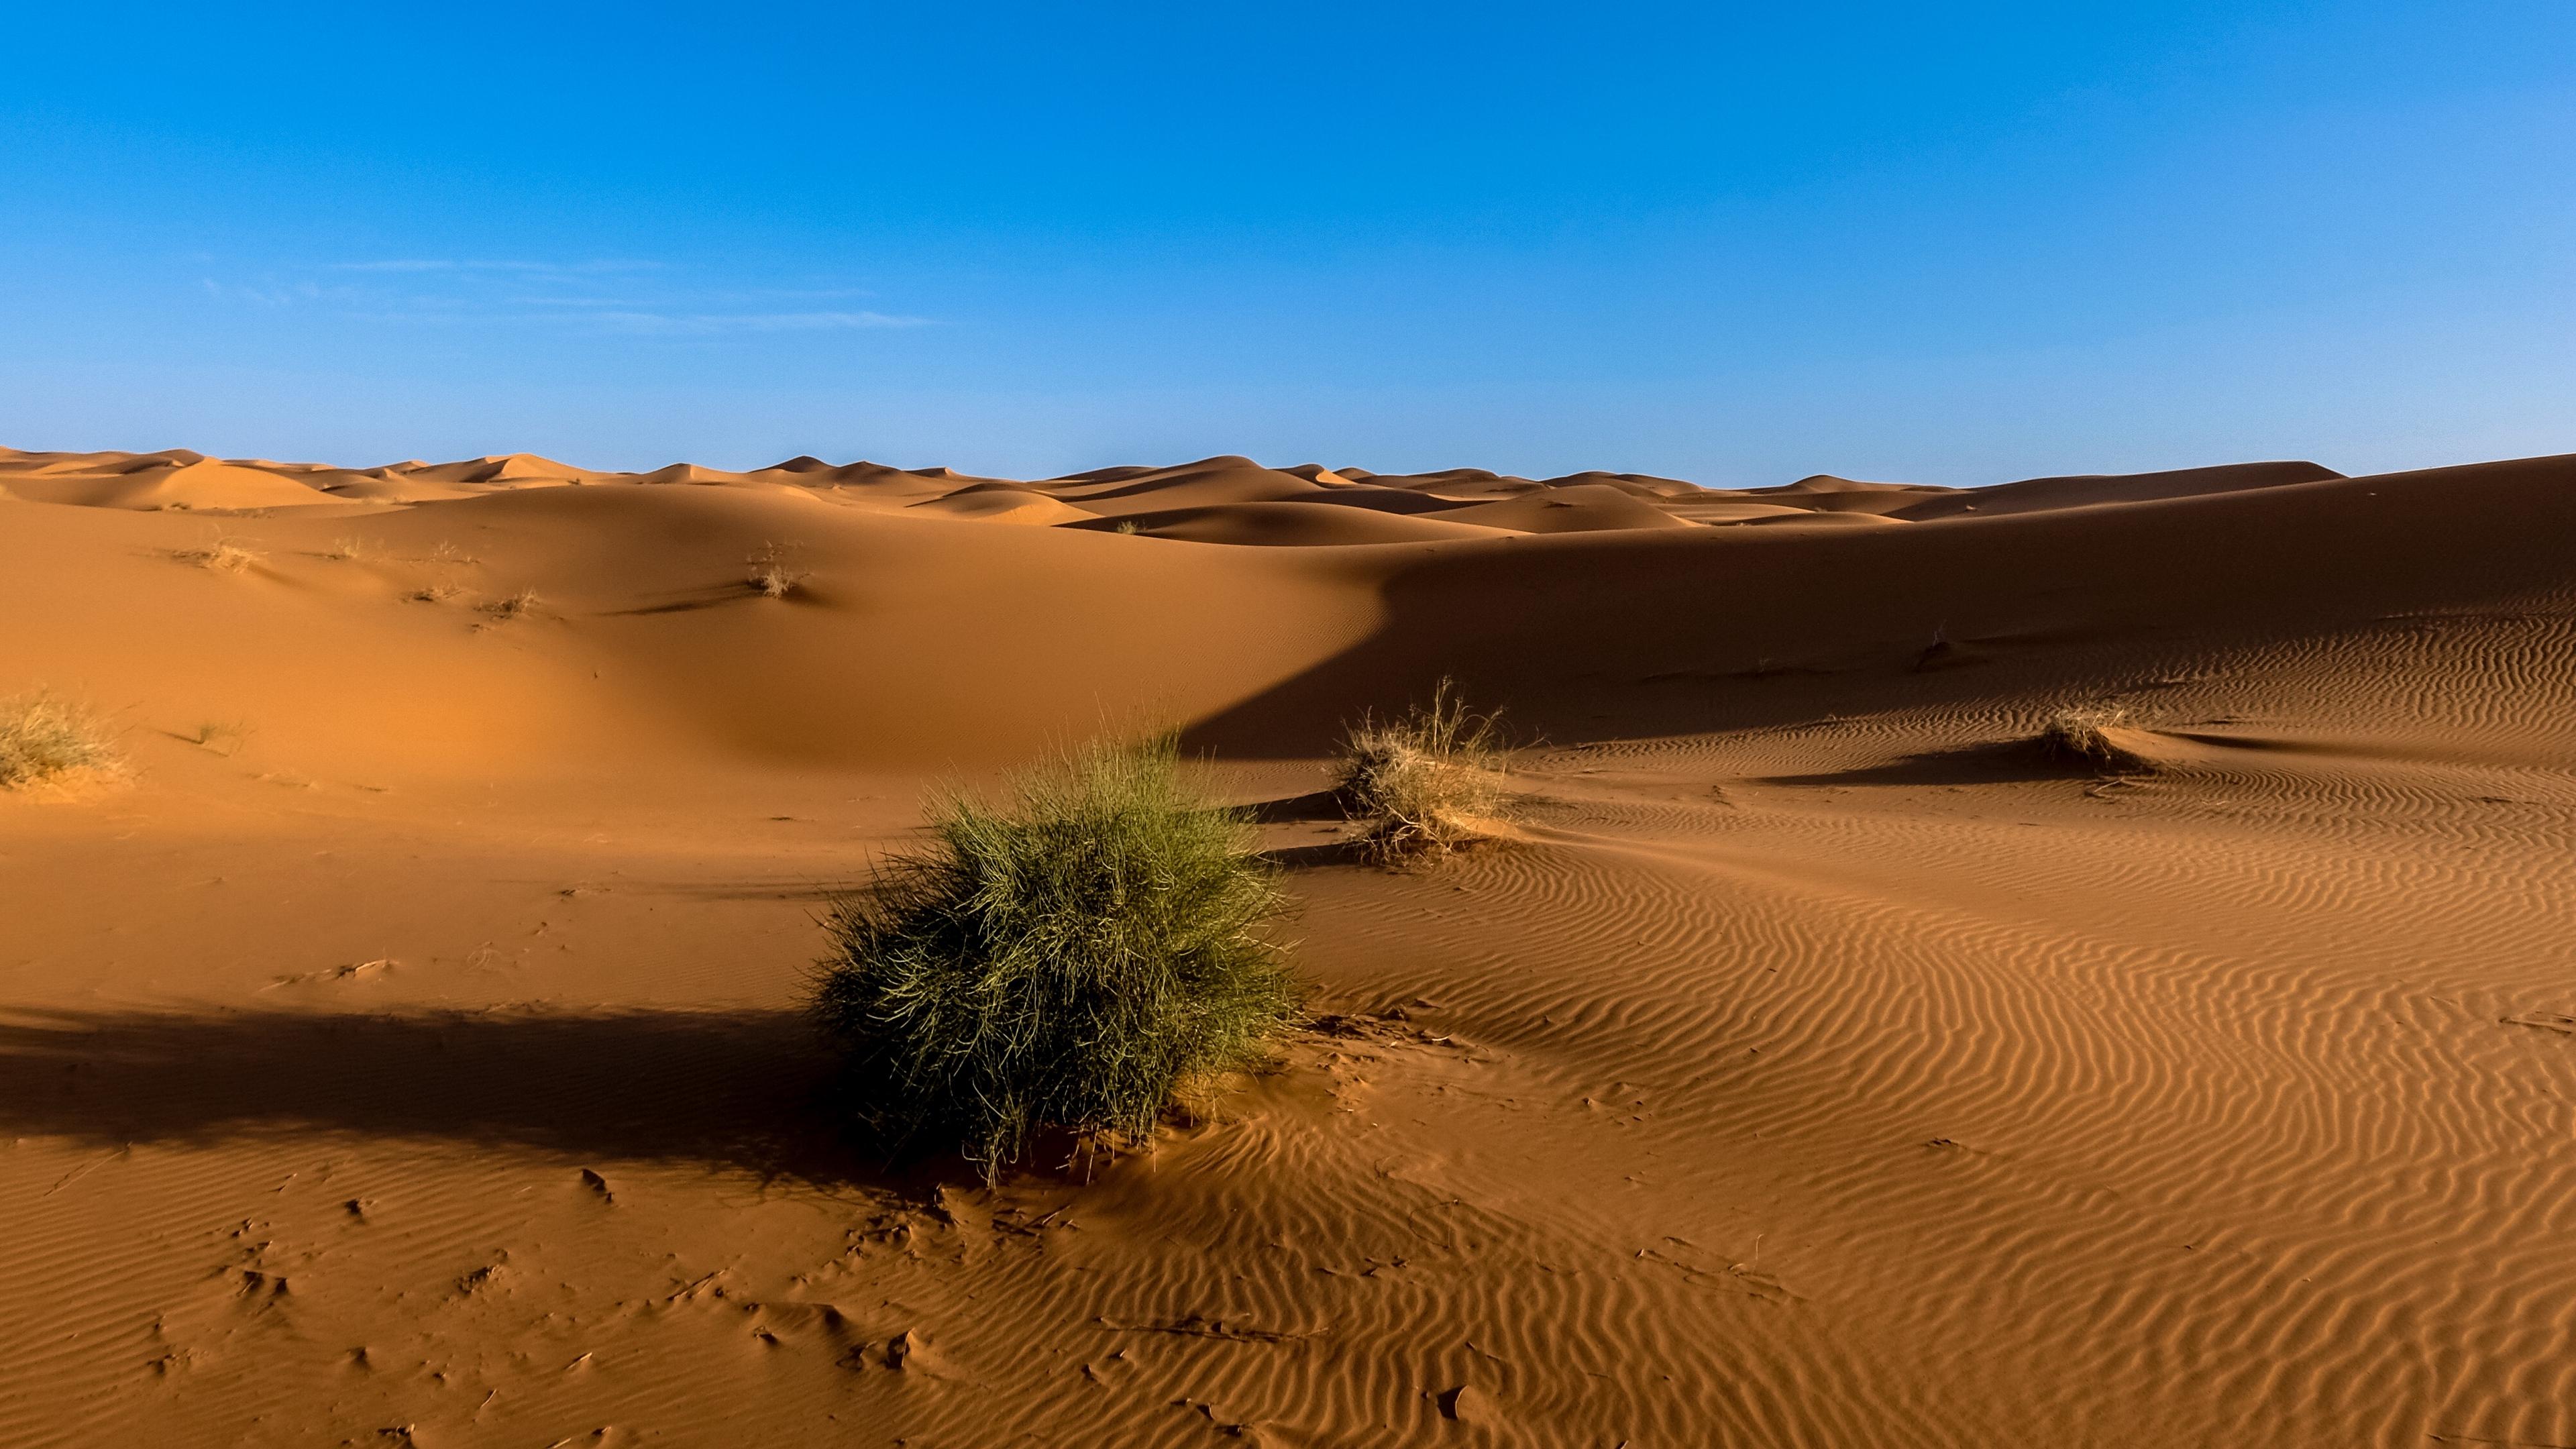 sahara desert sand sky 4k 1541116603 - sahara, desert, sand, sky 4k - Sand, Sahara, Desert